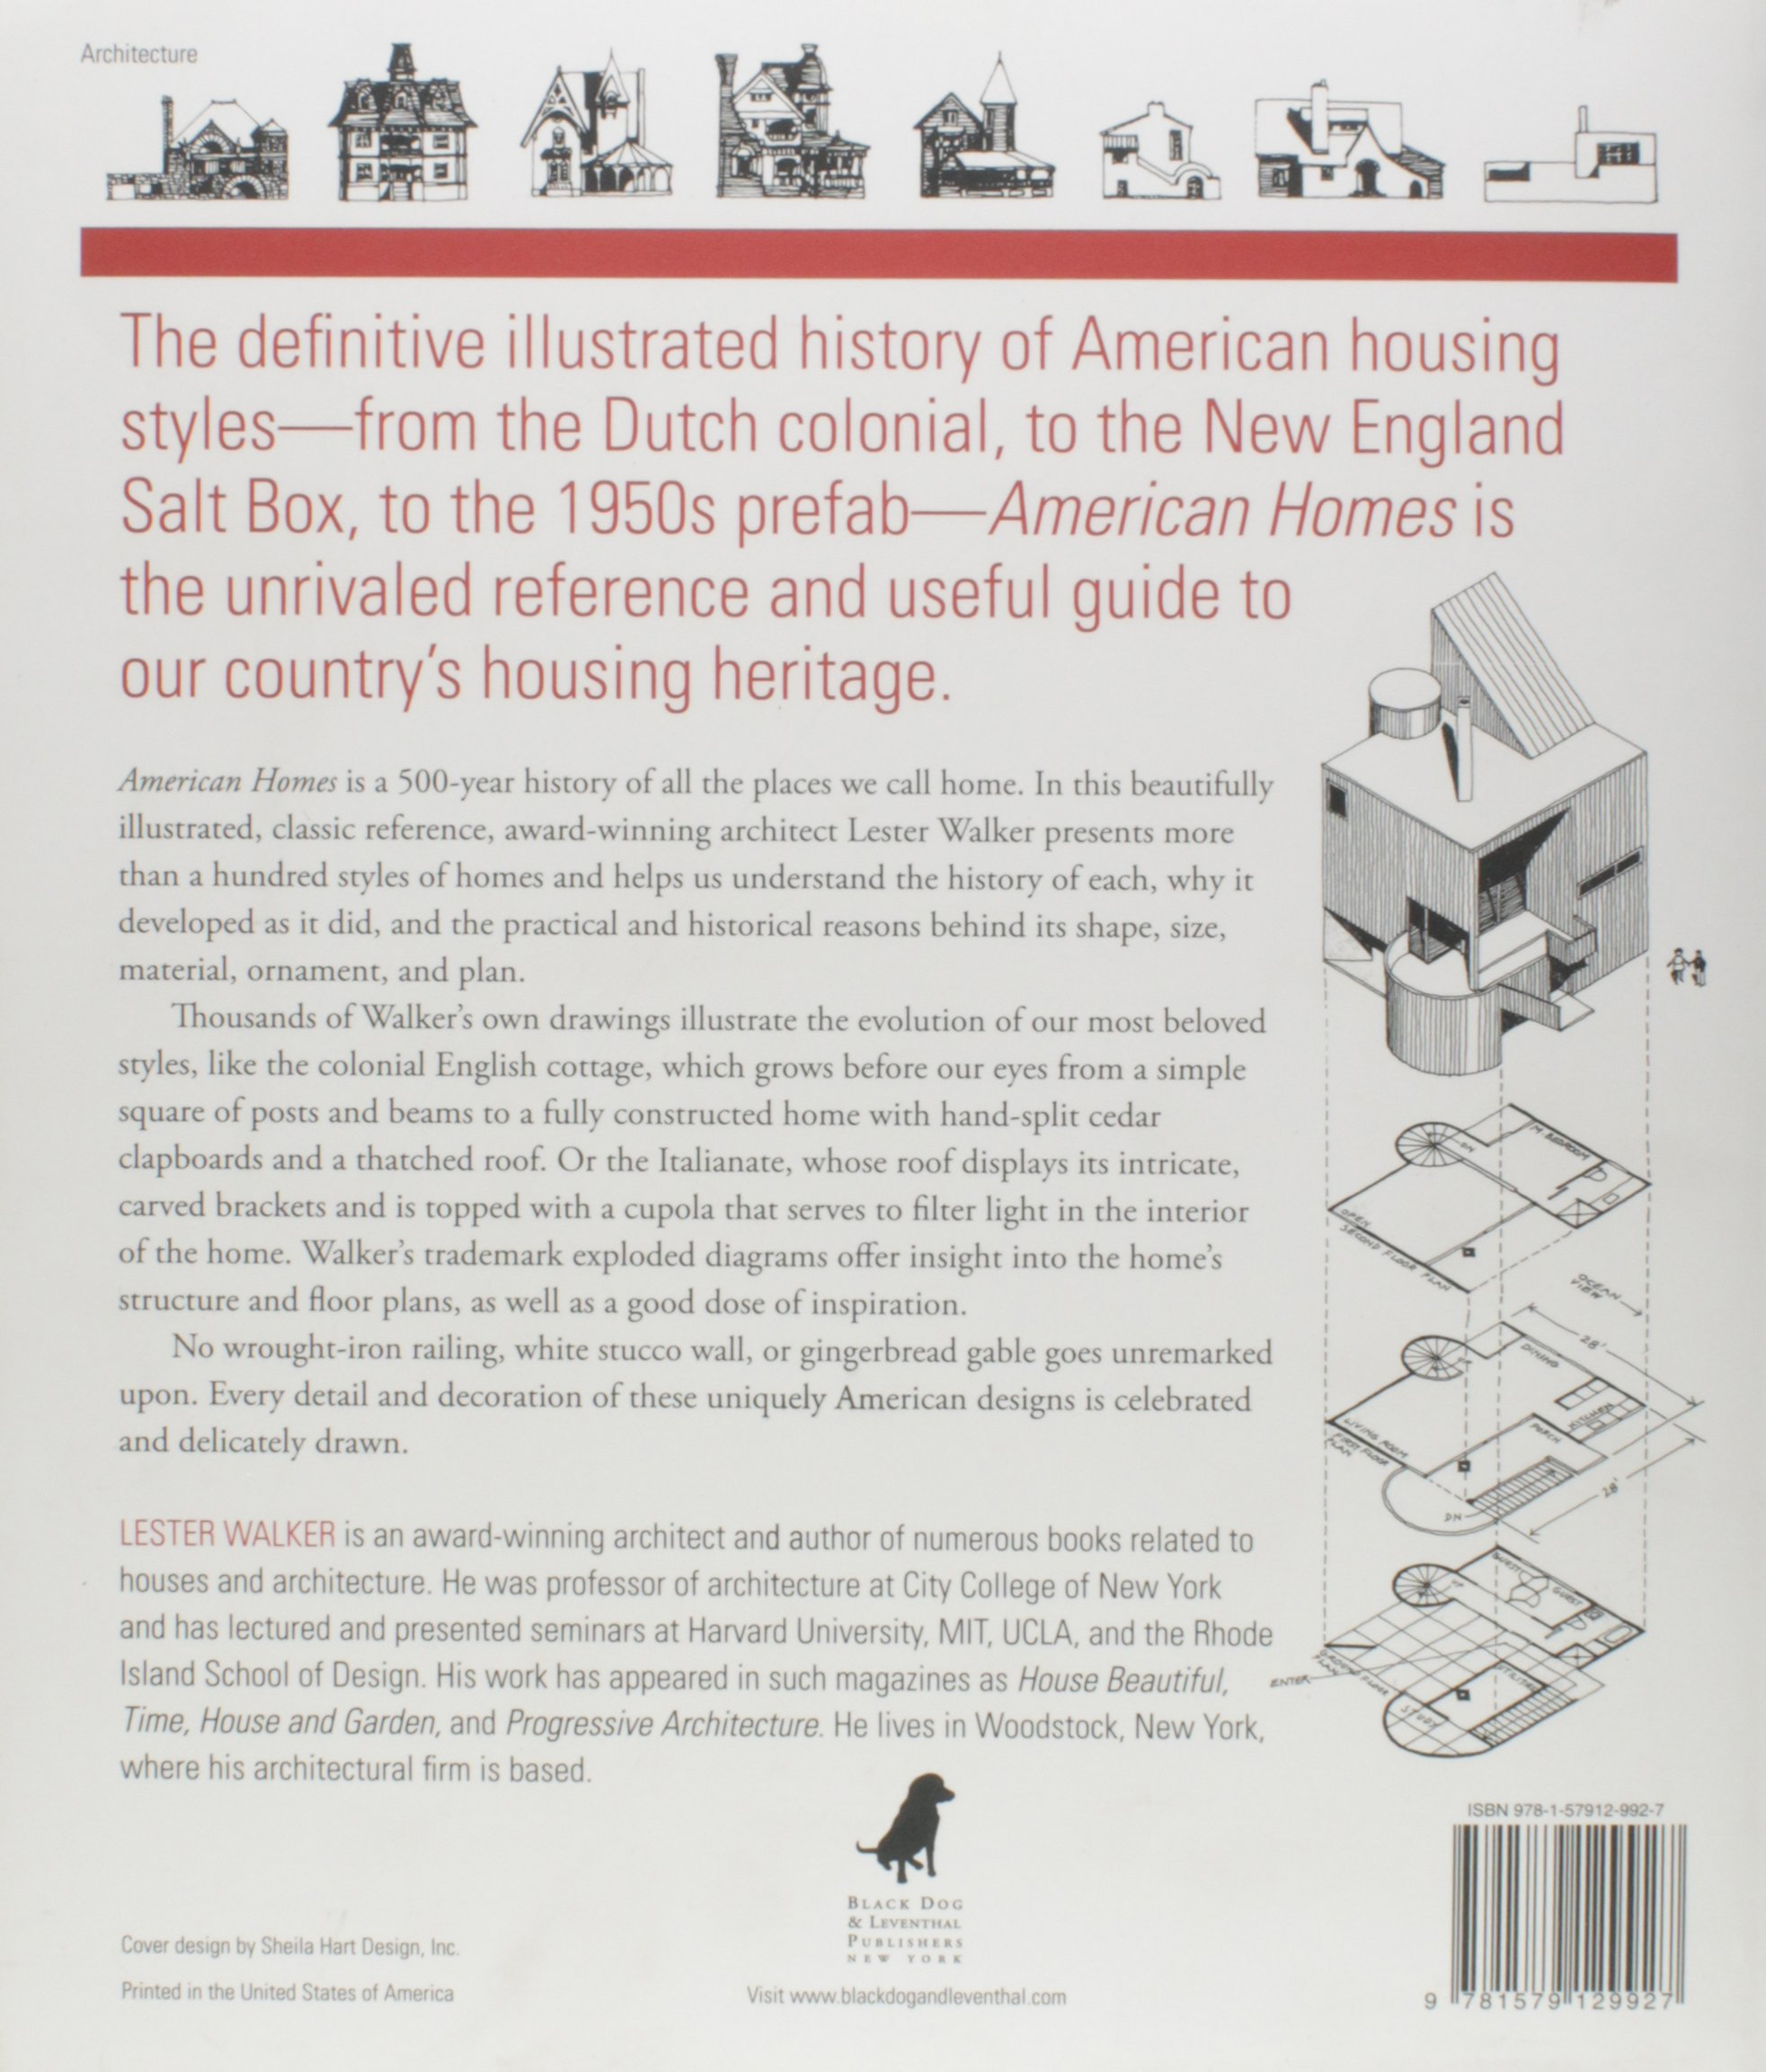 American Homes: The Landmark Illustrated Encyclopedia of